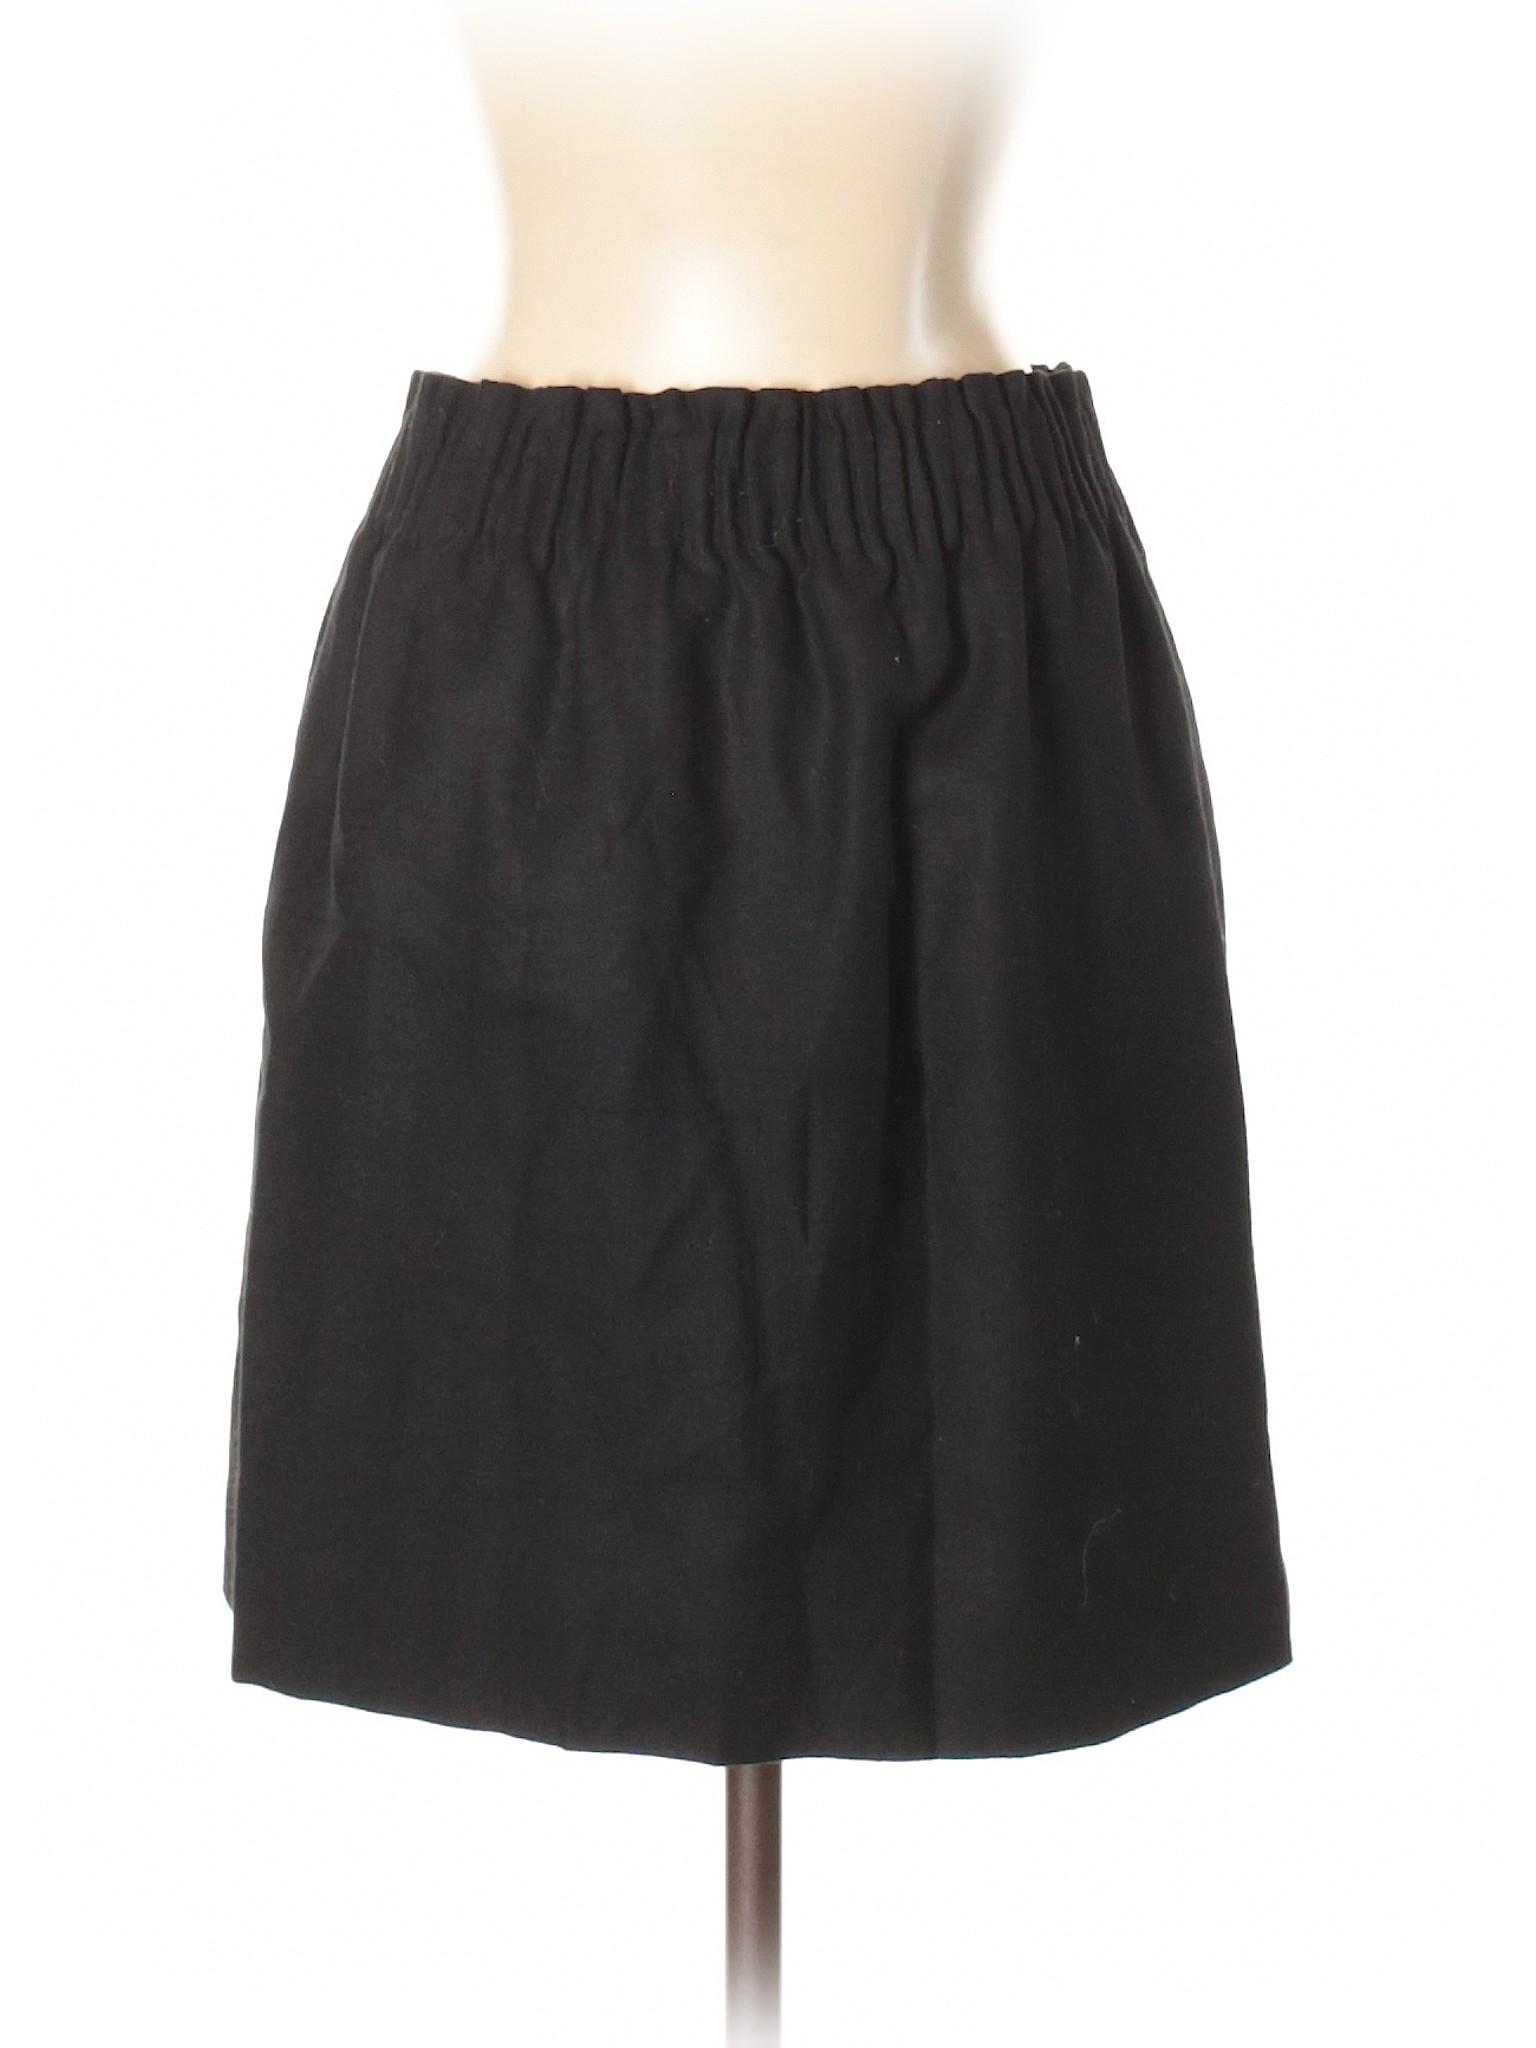 Wool Wool Boutique Skirt Boutique Skirt Skirt Boutique Boutique Wool 5w6C1qXxSn